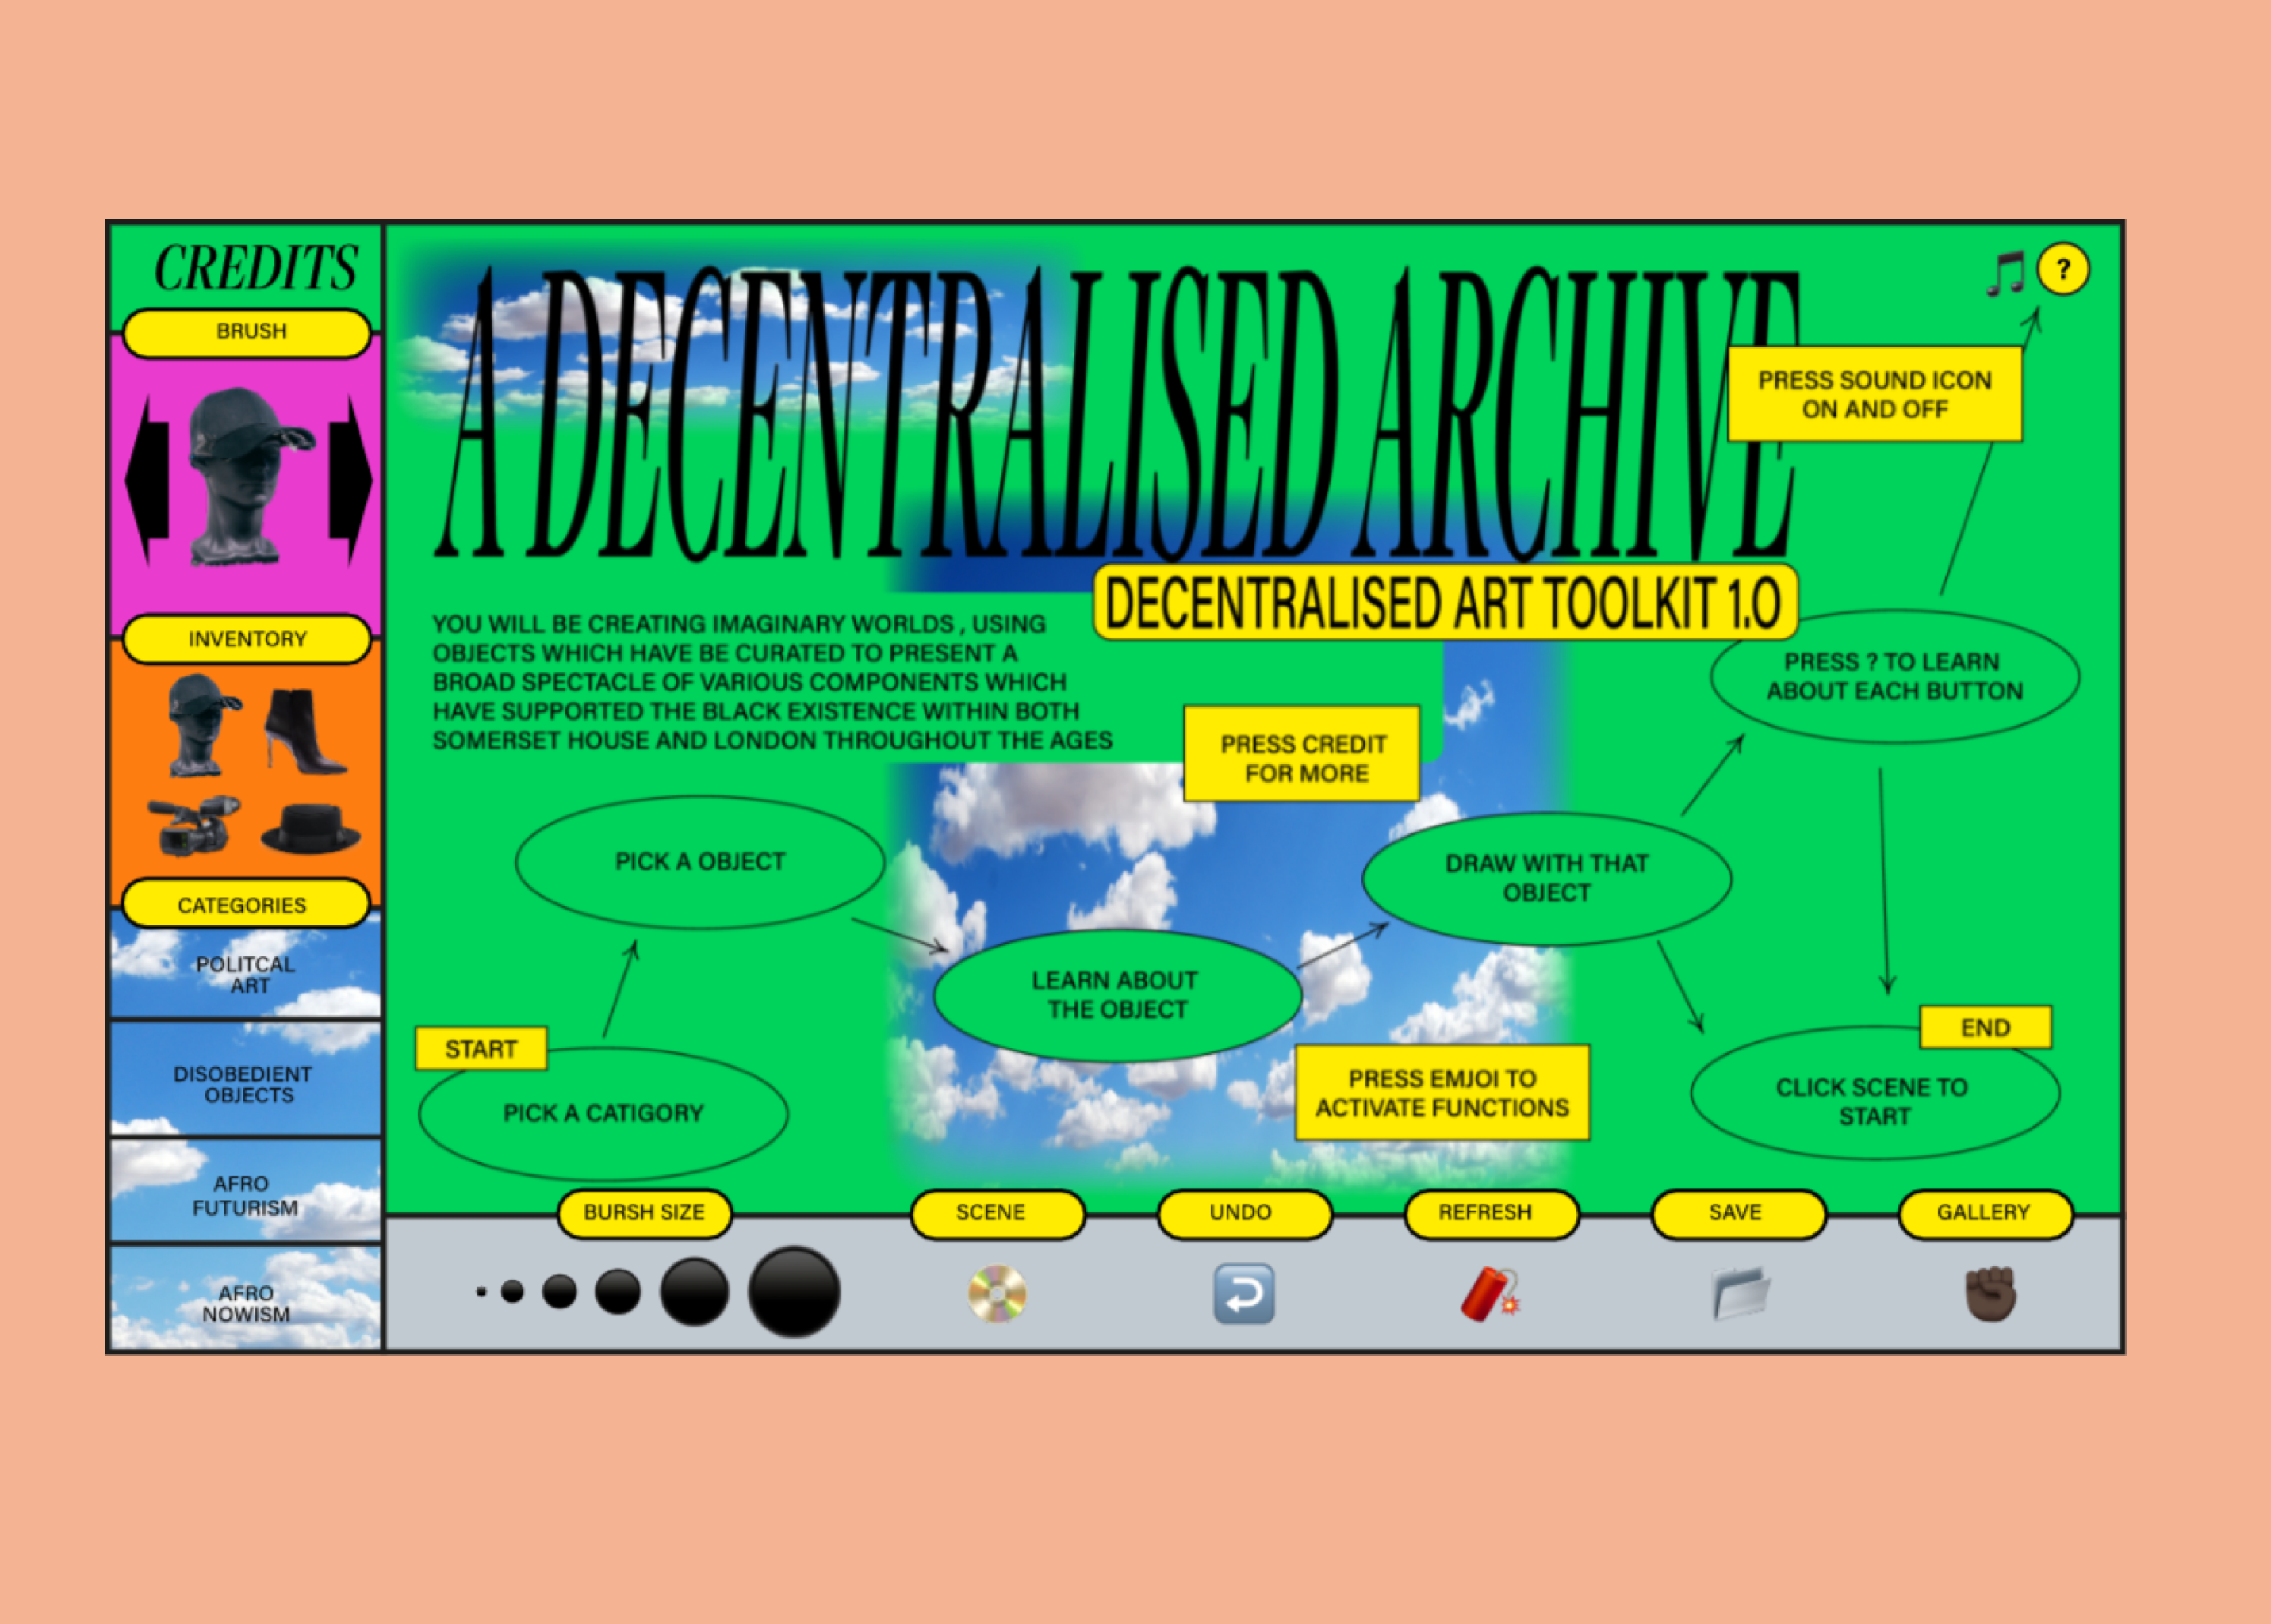 An interactive digital platform on Black British history & culture